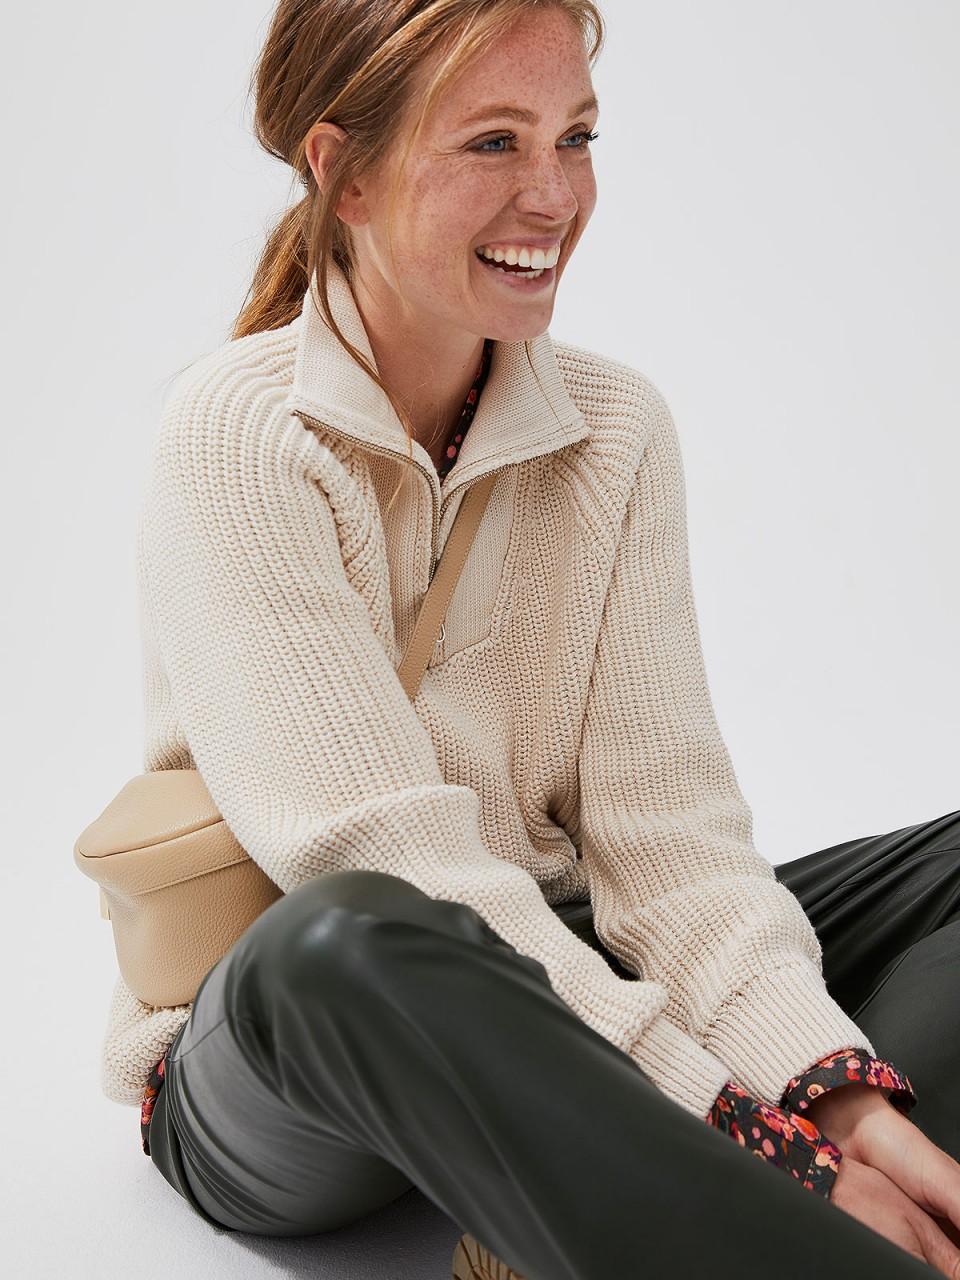 Oberteile - SMITH SOUL Damen Strickpullover, creme  - Onlineshop Designermode.com